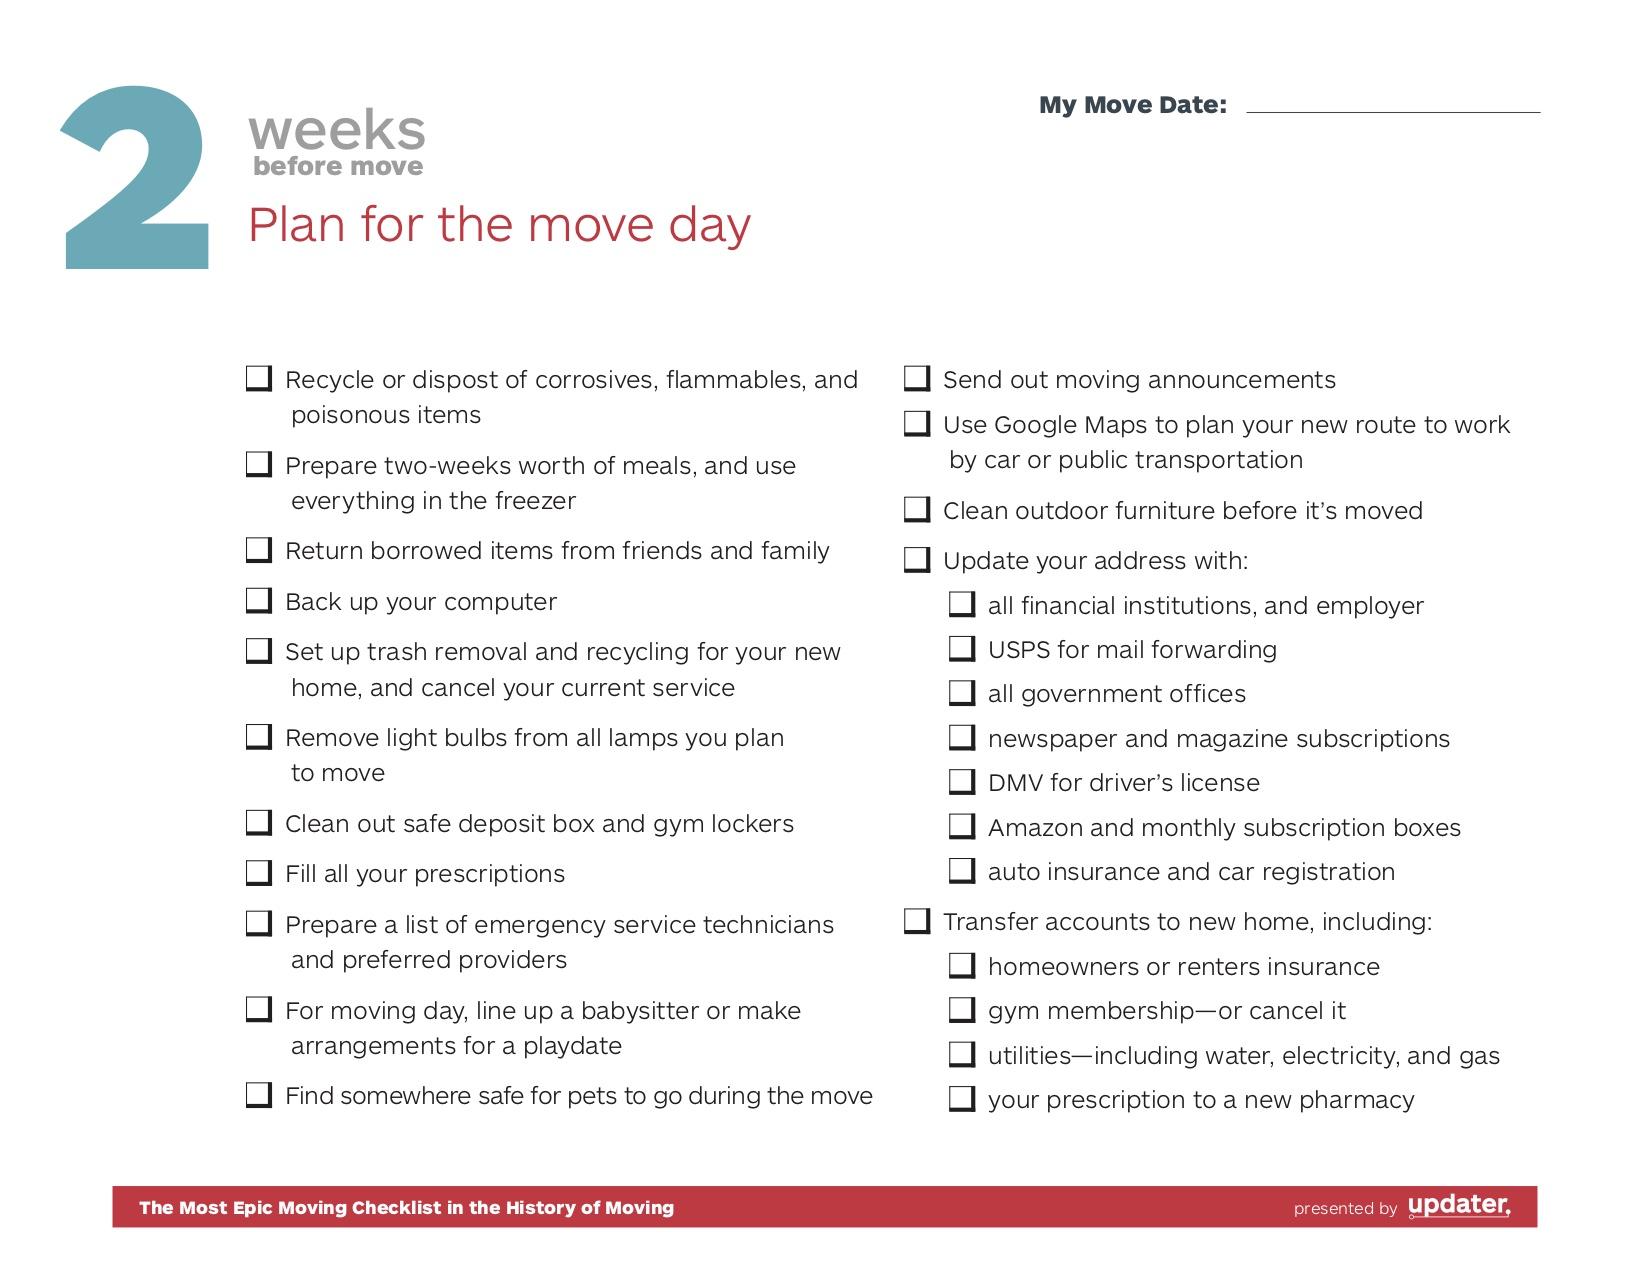 moving-checklist-2wks.jpg